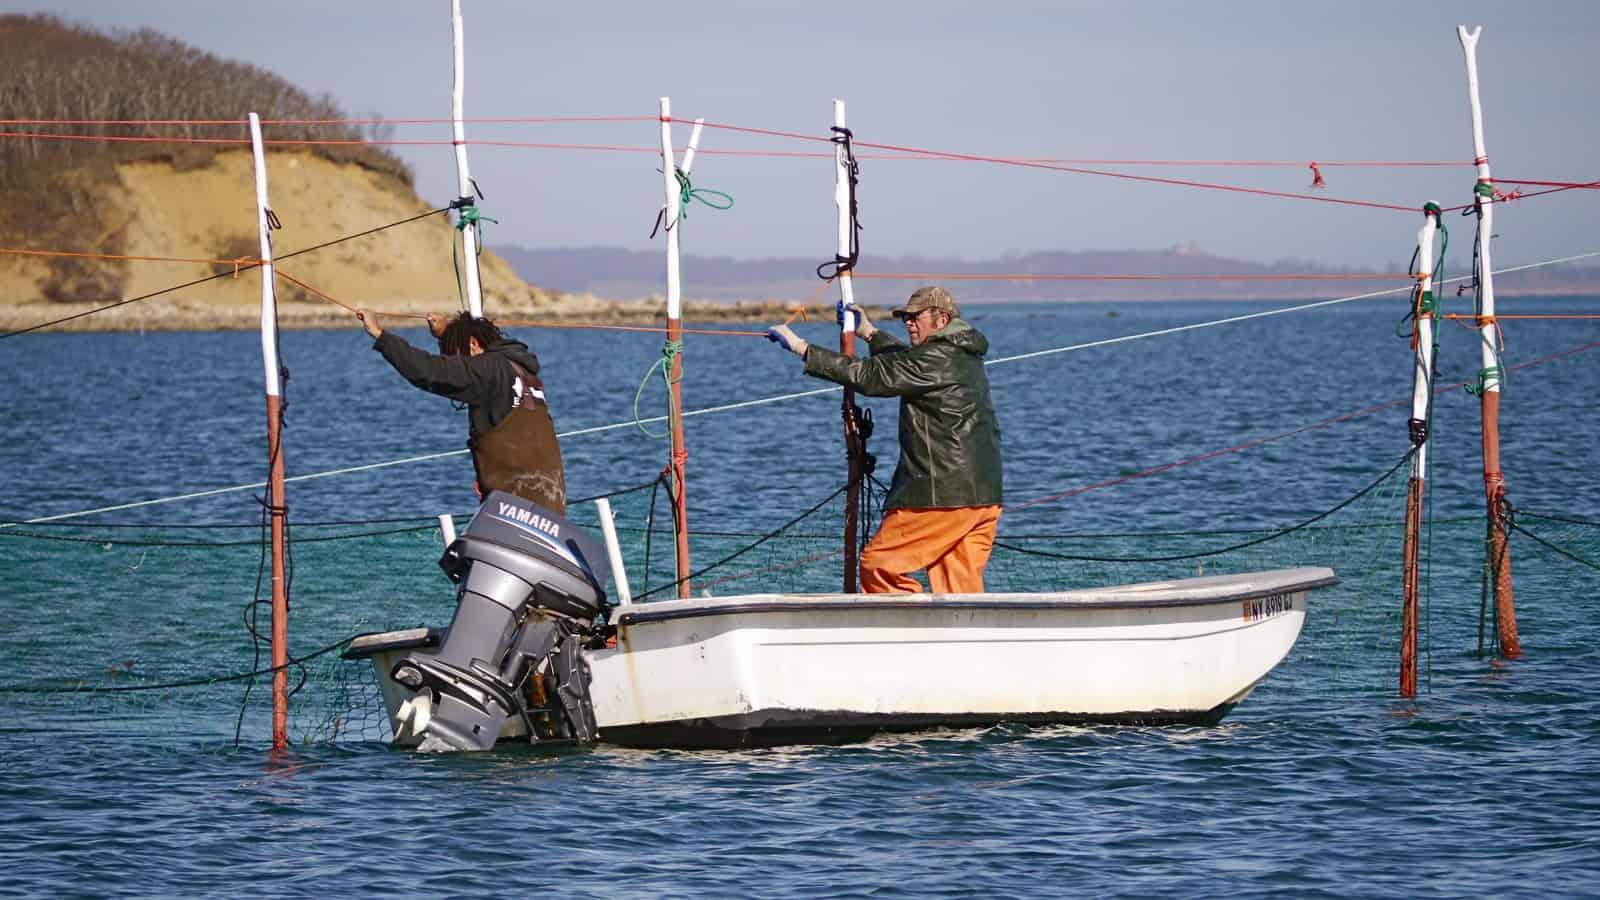 Catamaran Mon Tiki: Sailing Charters , Sunset Cruises and Private Corporate Events in Montauk, the Hamptons